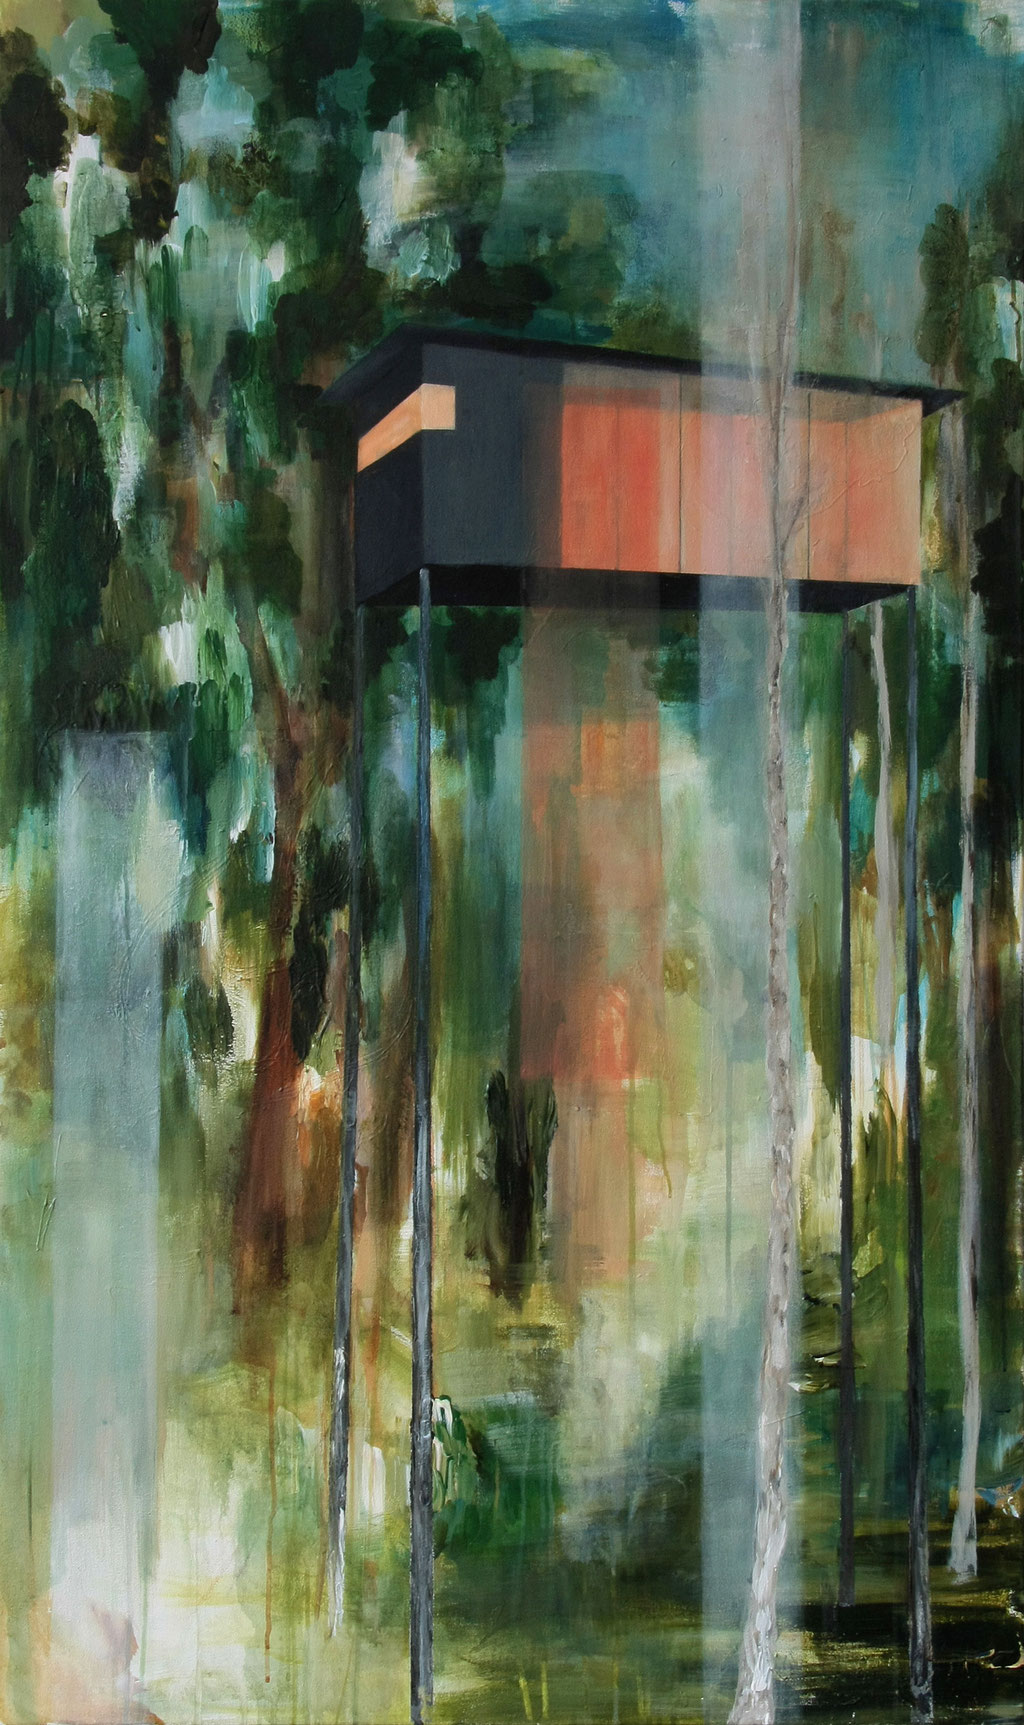 Baumhaus, 150 x 90 cm, Acryl auf Leinwand, 2015. /verkauft/